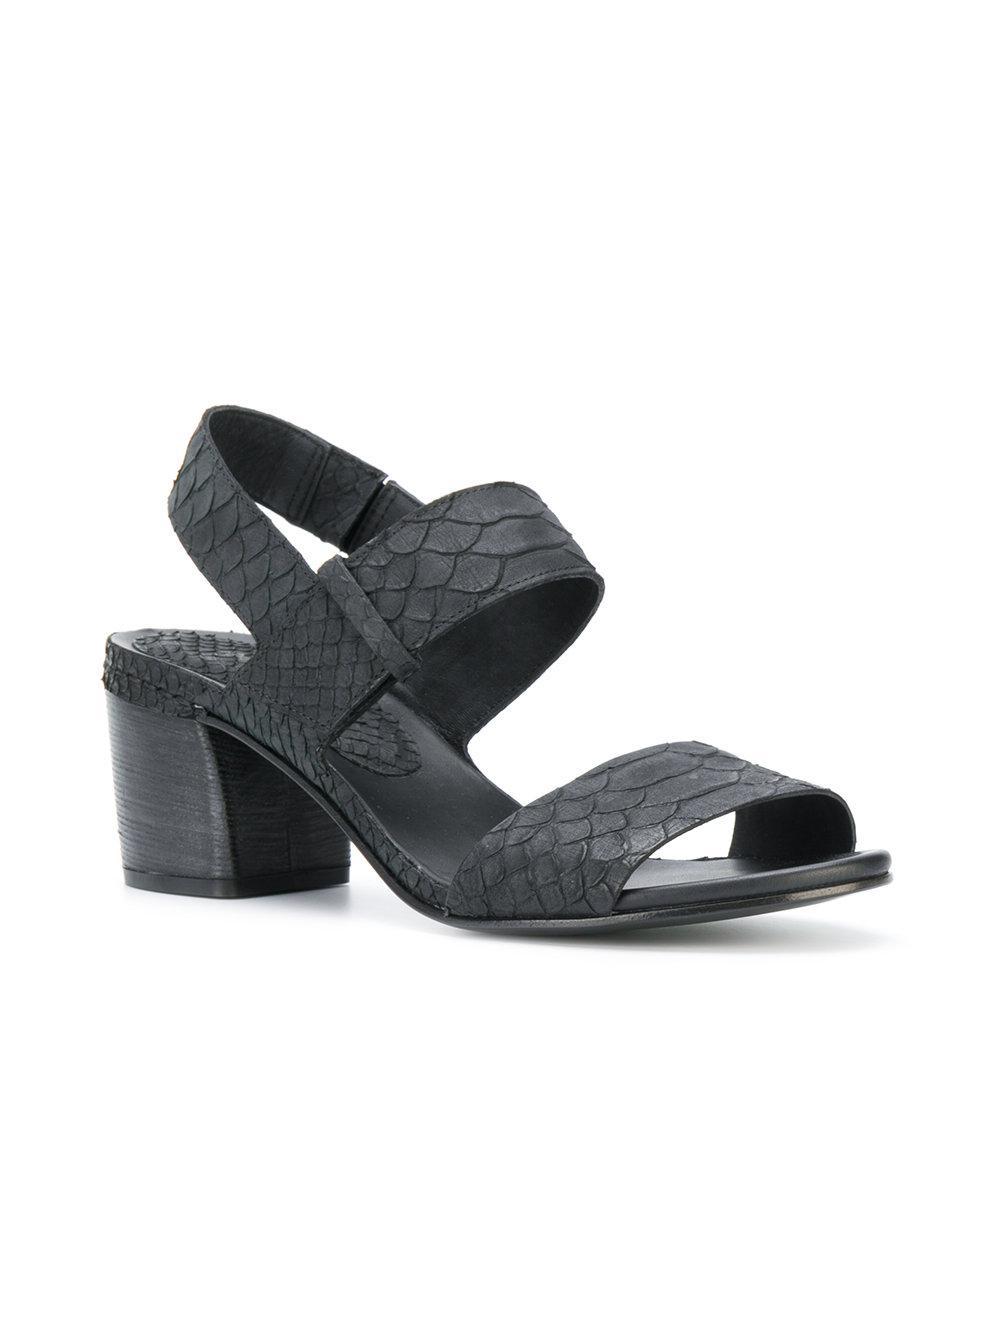 ROBERTO DEL CARLO Snakeskin effect sandals HhI07n